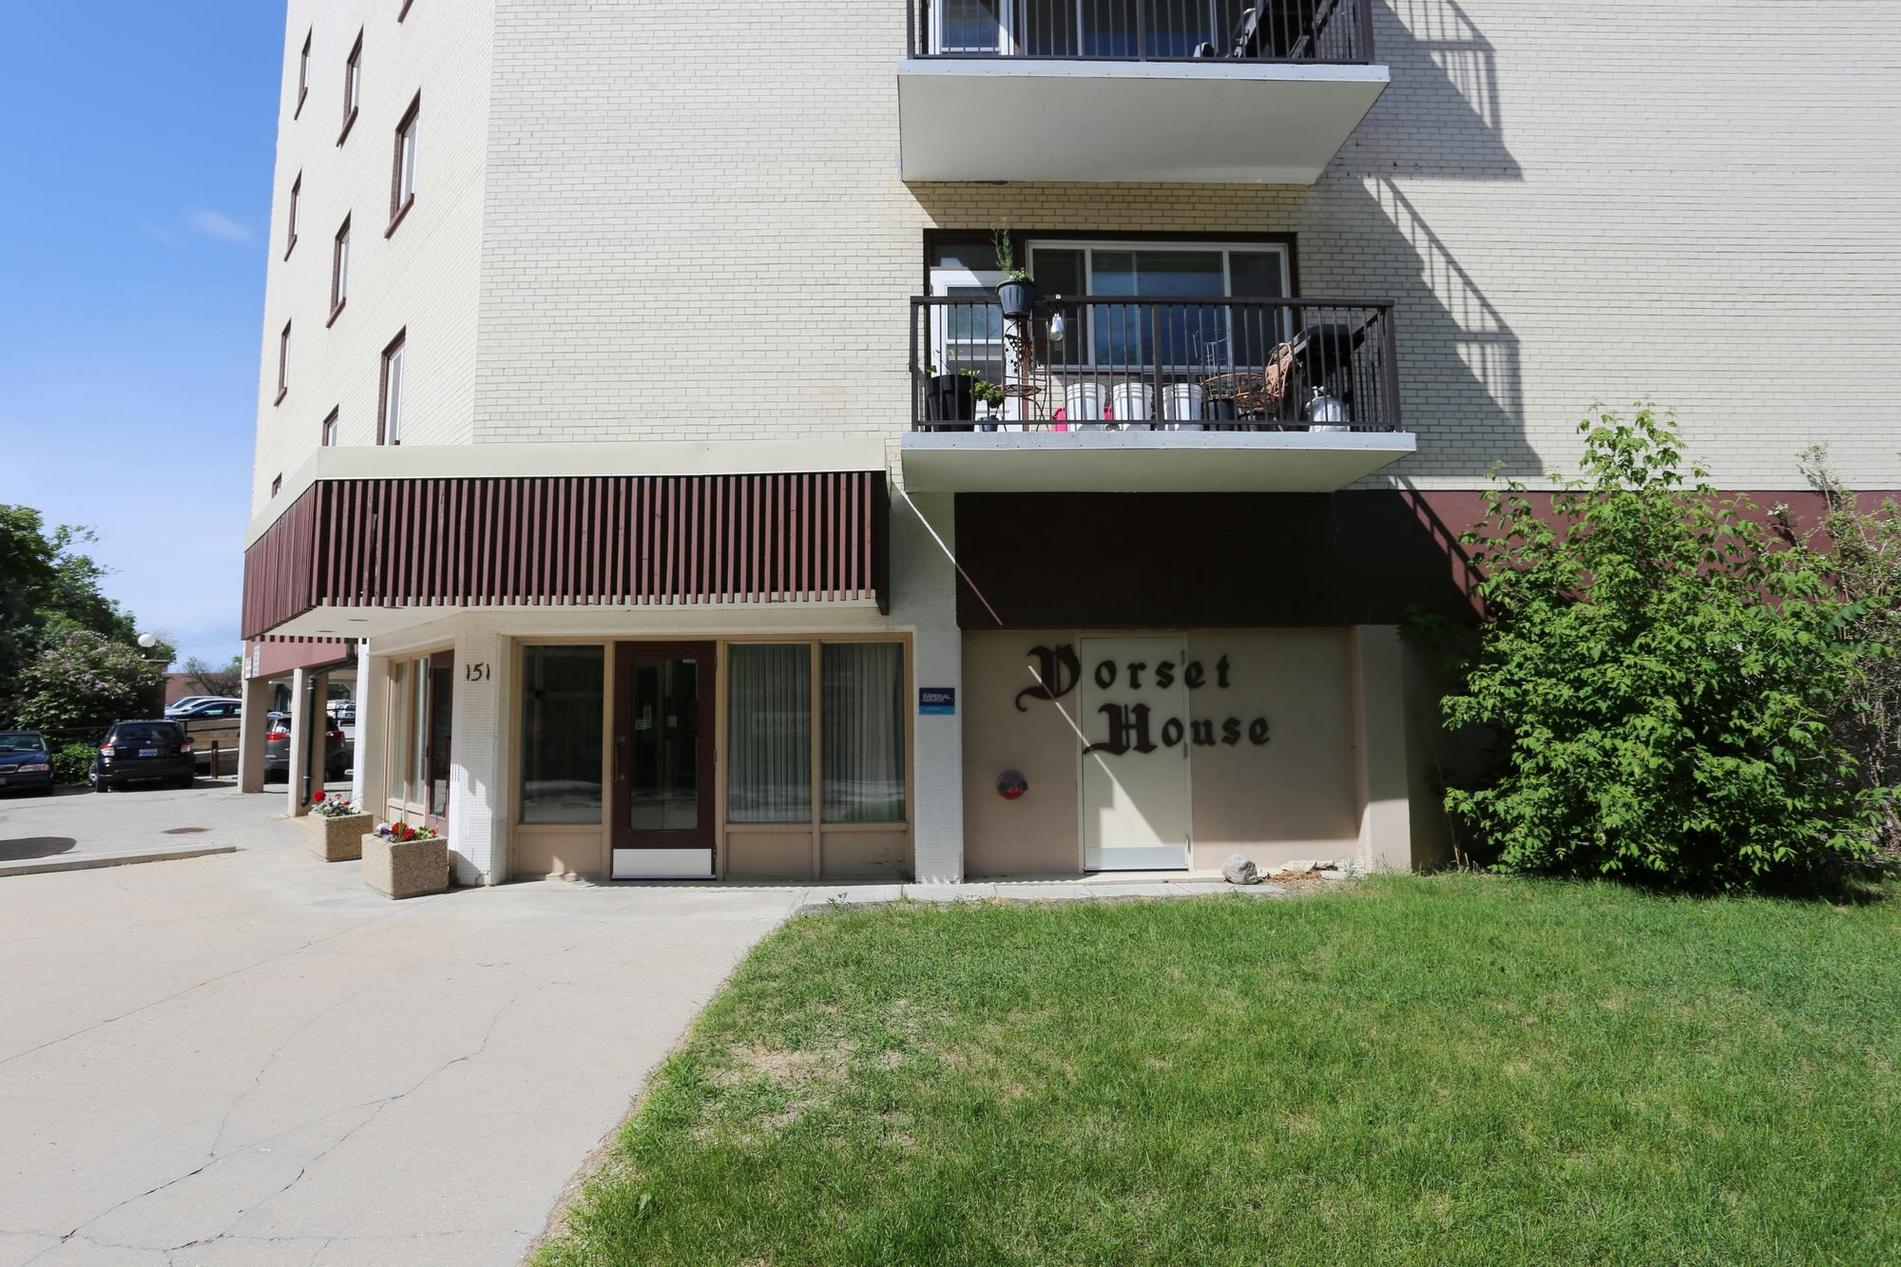 18-151 Roslyn Road, Winnipeg, Manitoba  R3L 0G5 - Photo 1 - 1816191